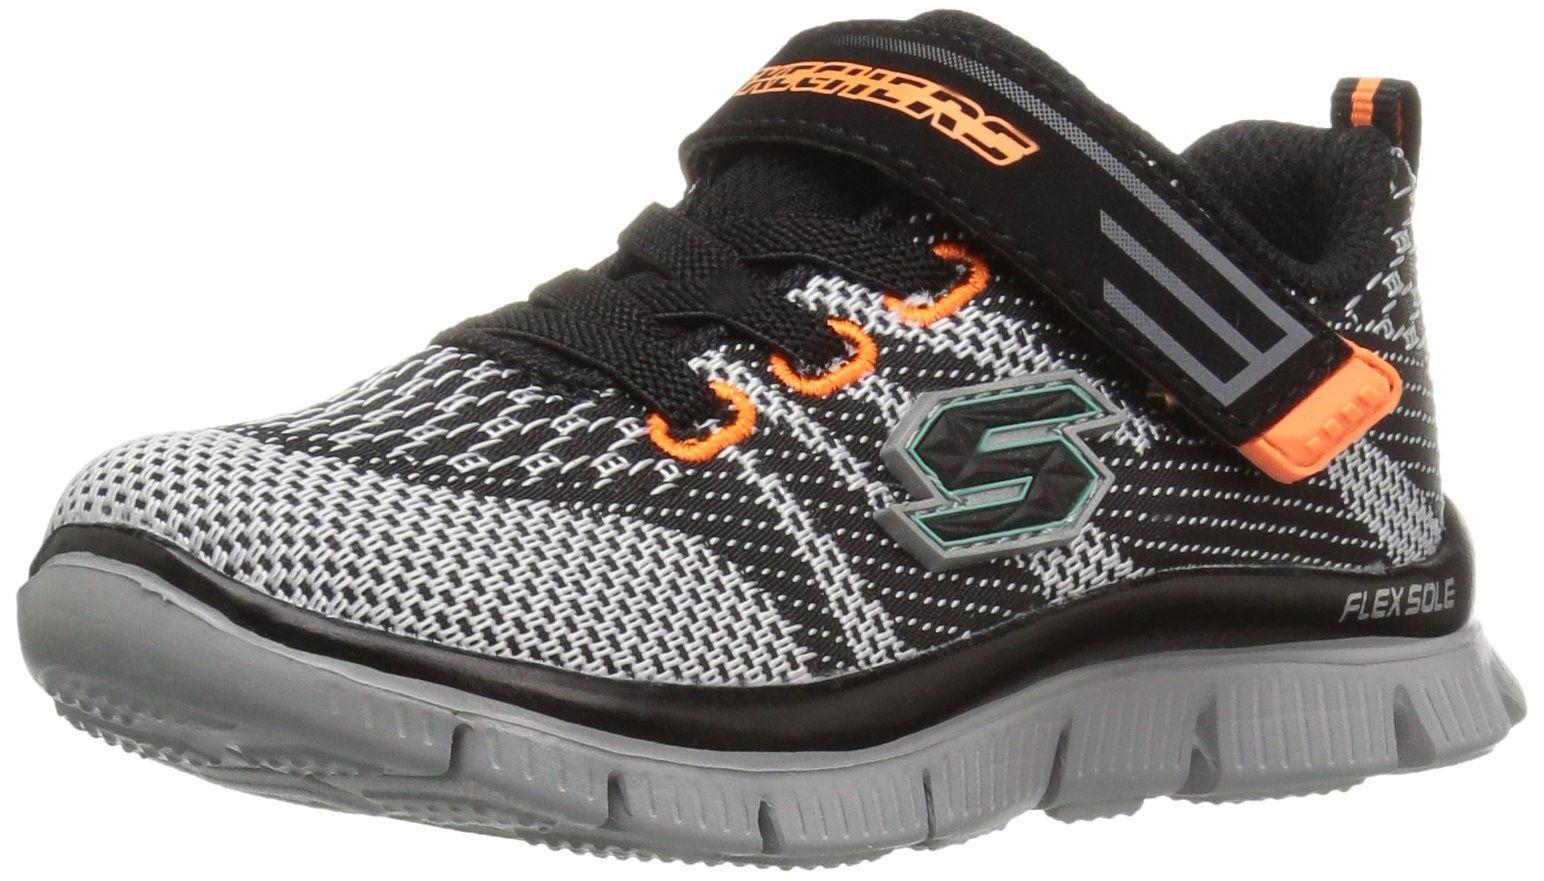 Skechers Hombre Mind Hombre' Flex Advantage Master Mind Hombre Running Zapatos, Negro 5fcd2a